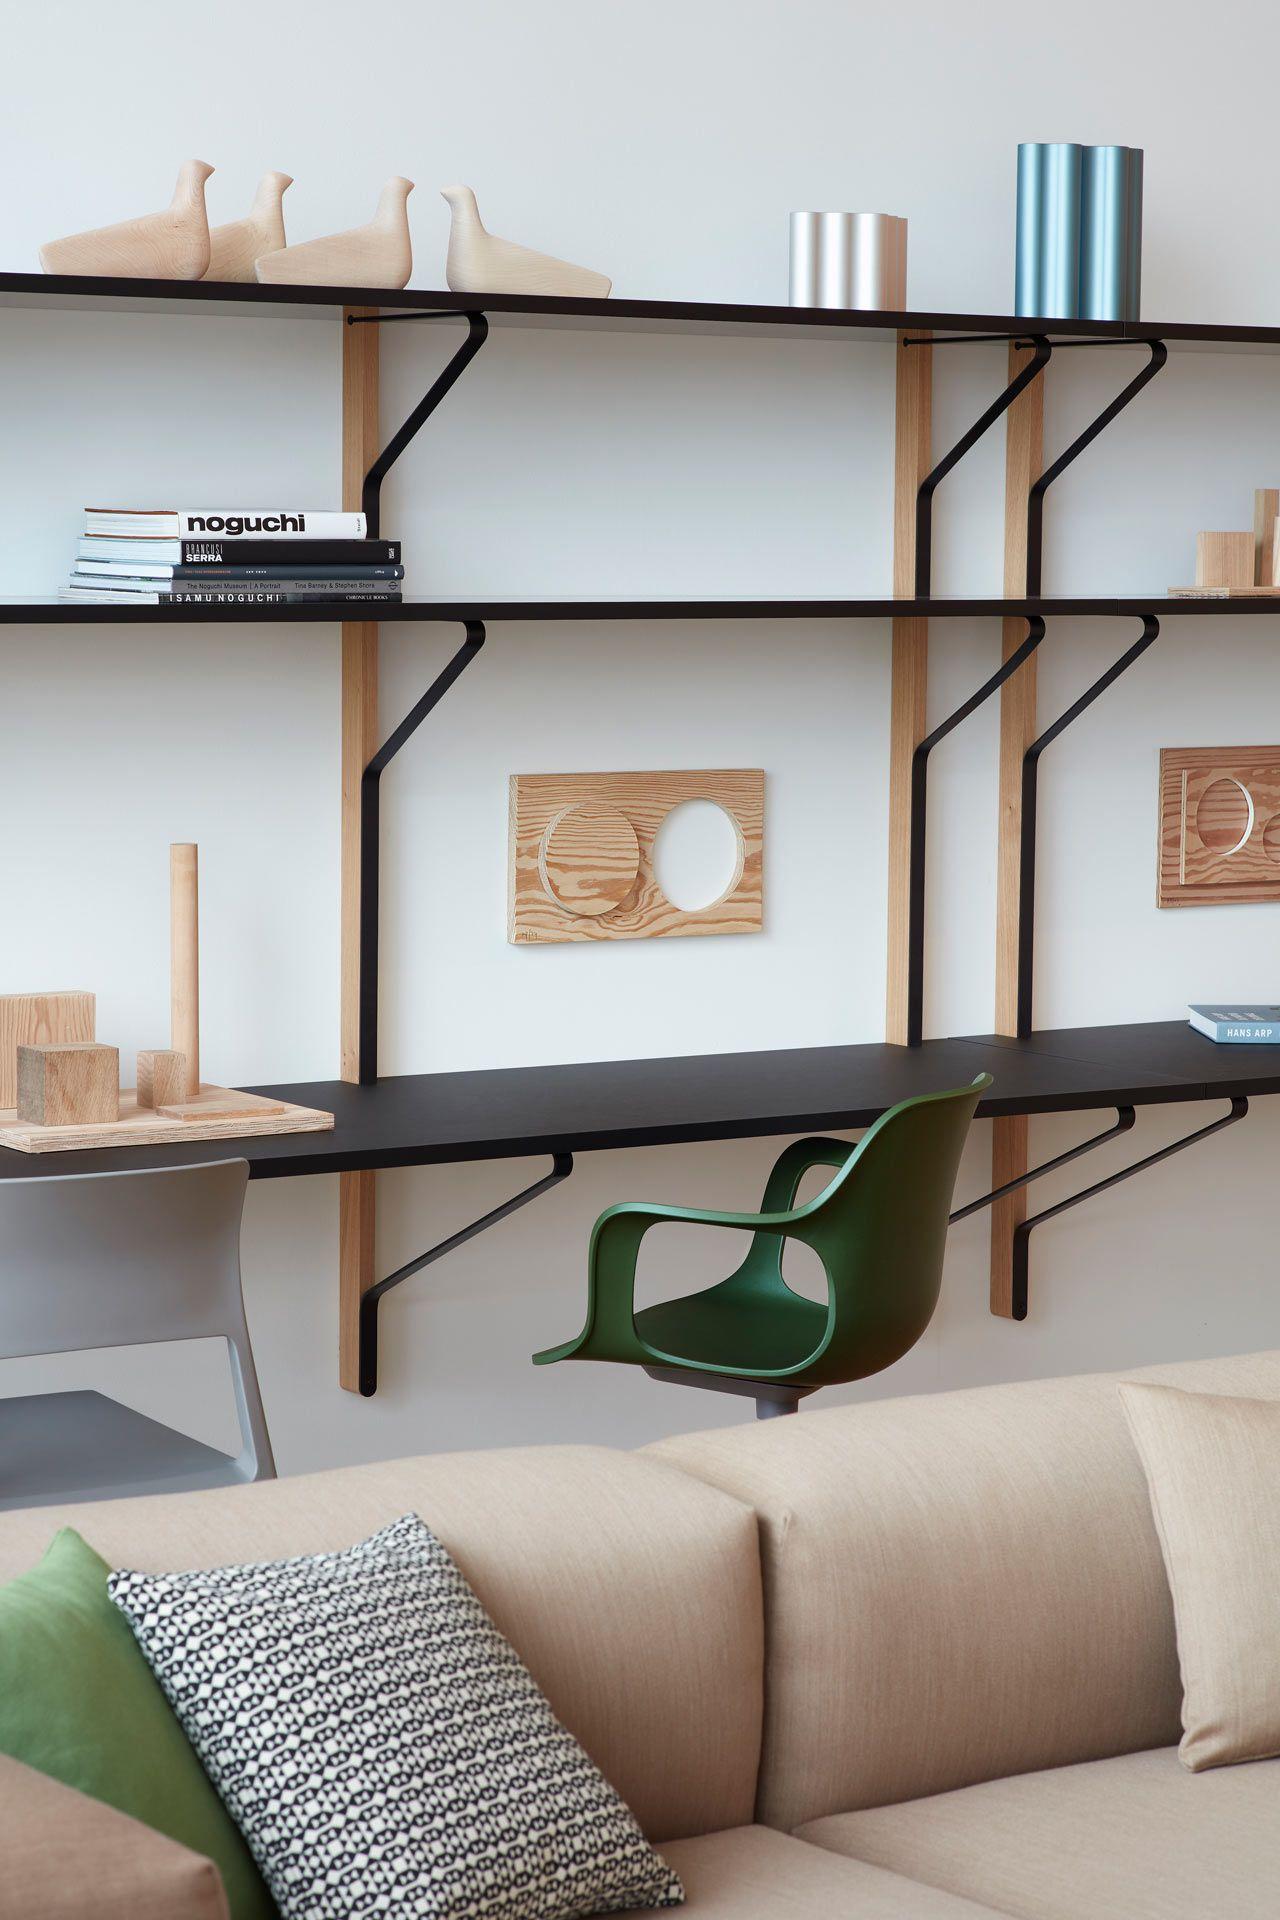 Jasper morrisons ambient installation at vitrahaus design milk